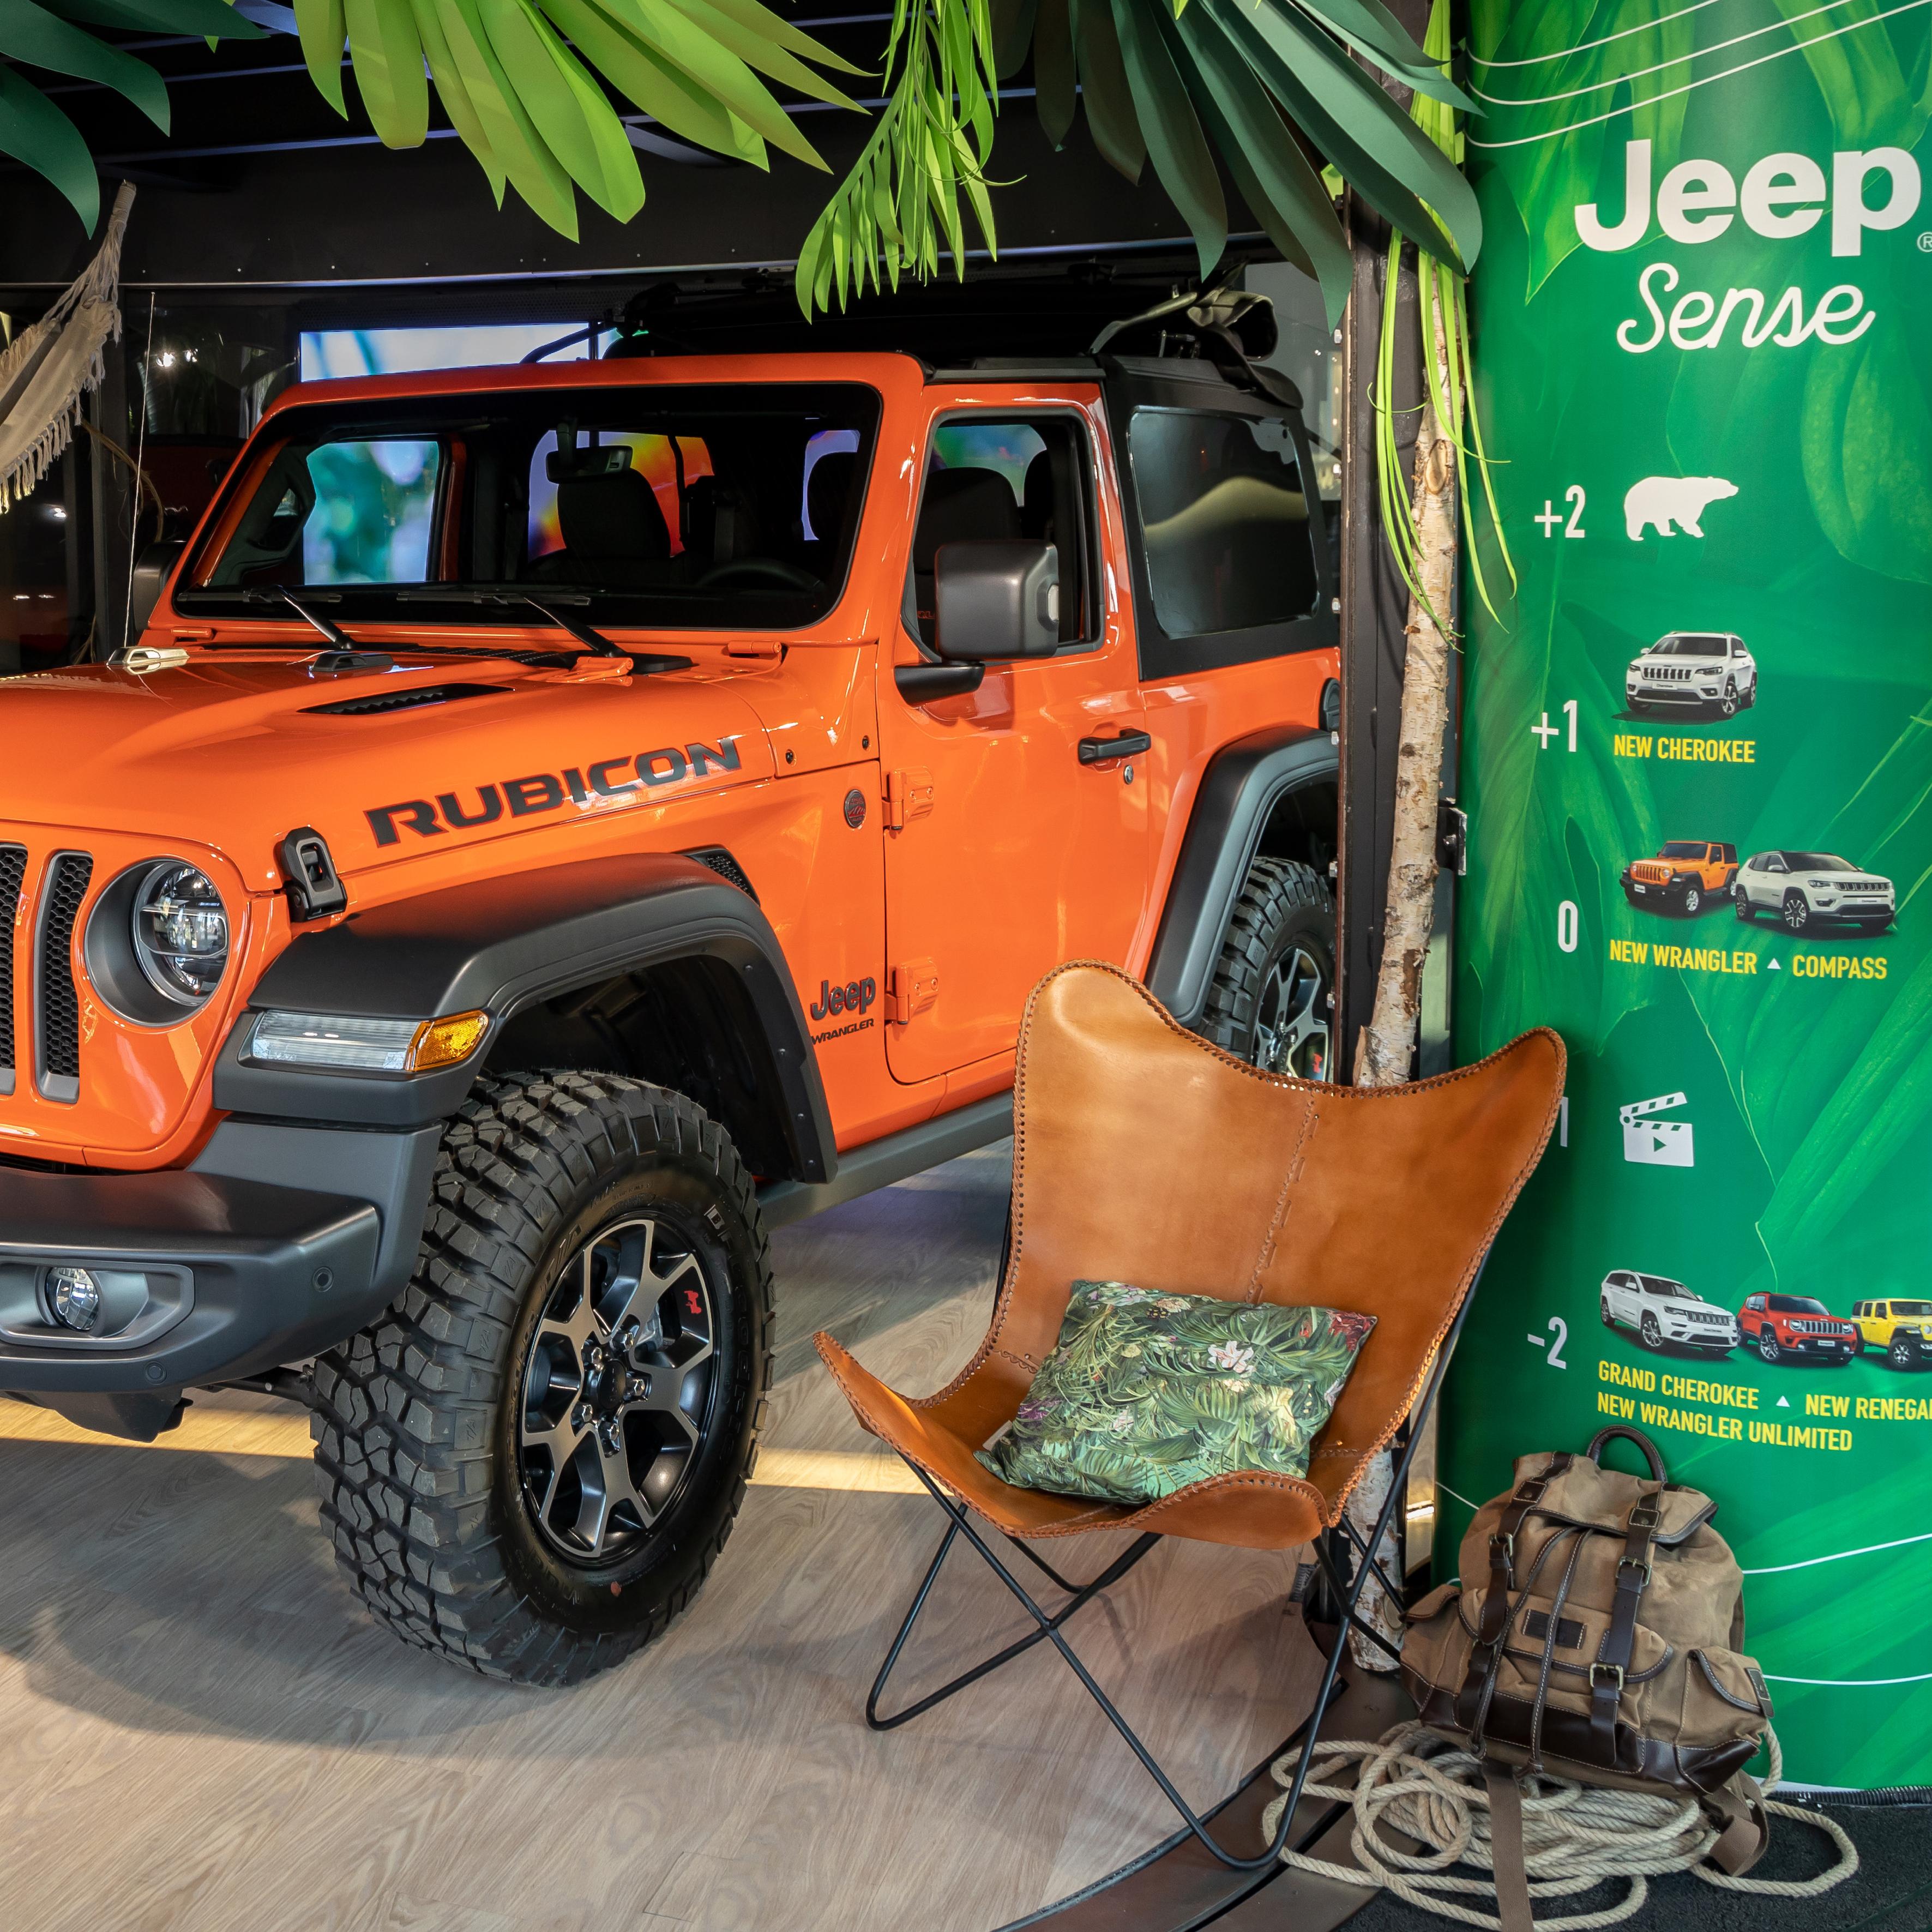 Une Jeep orange au MotorVillage